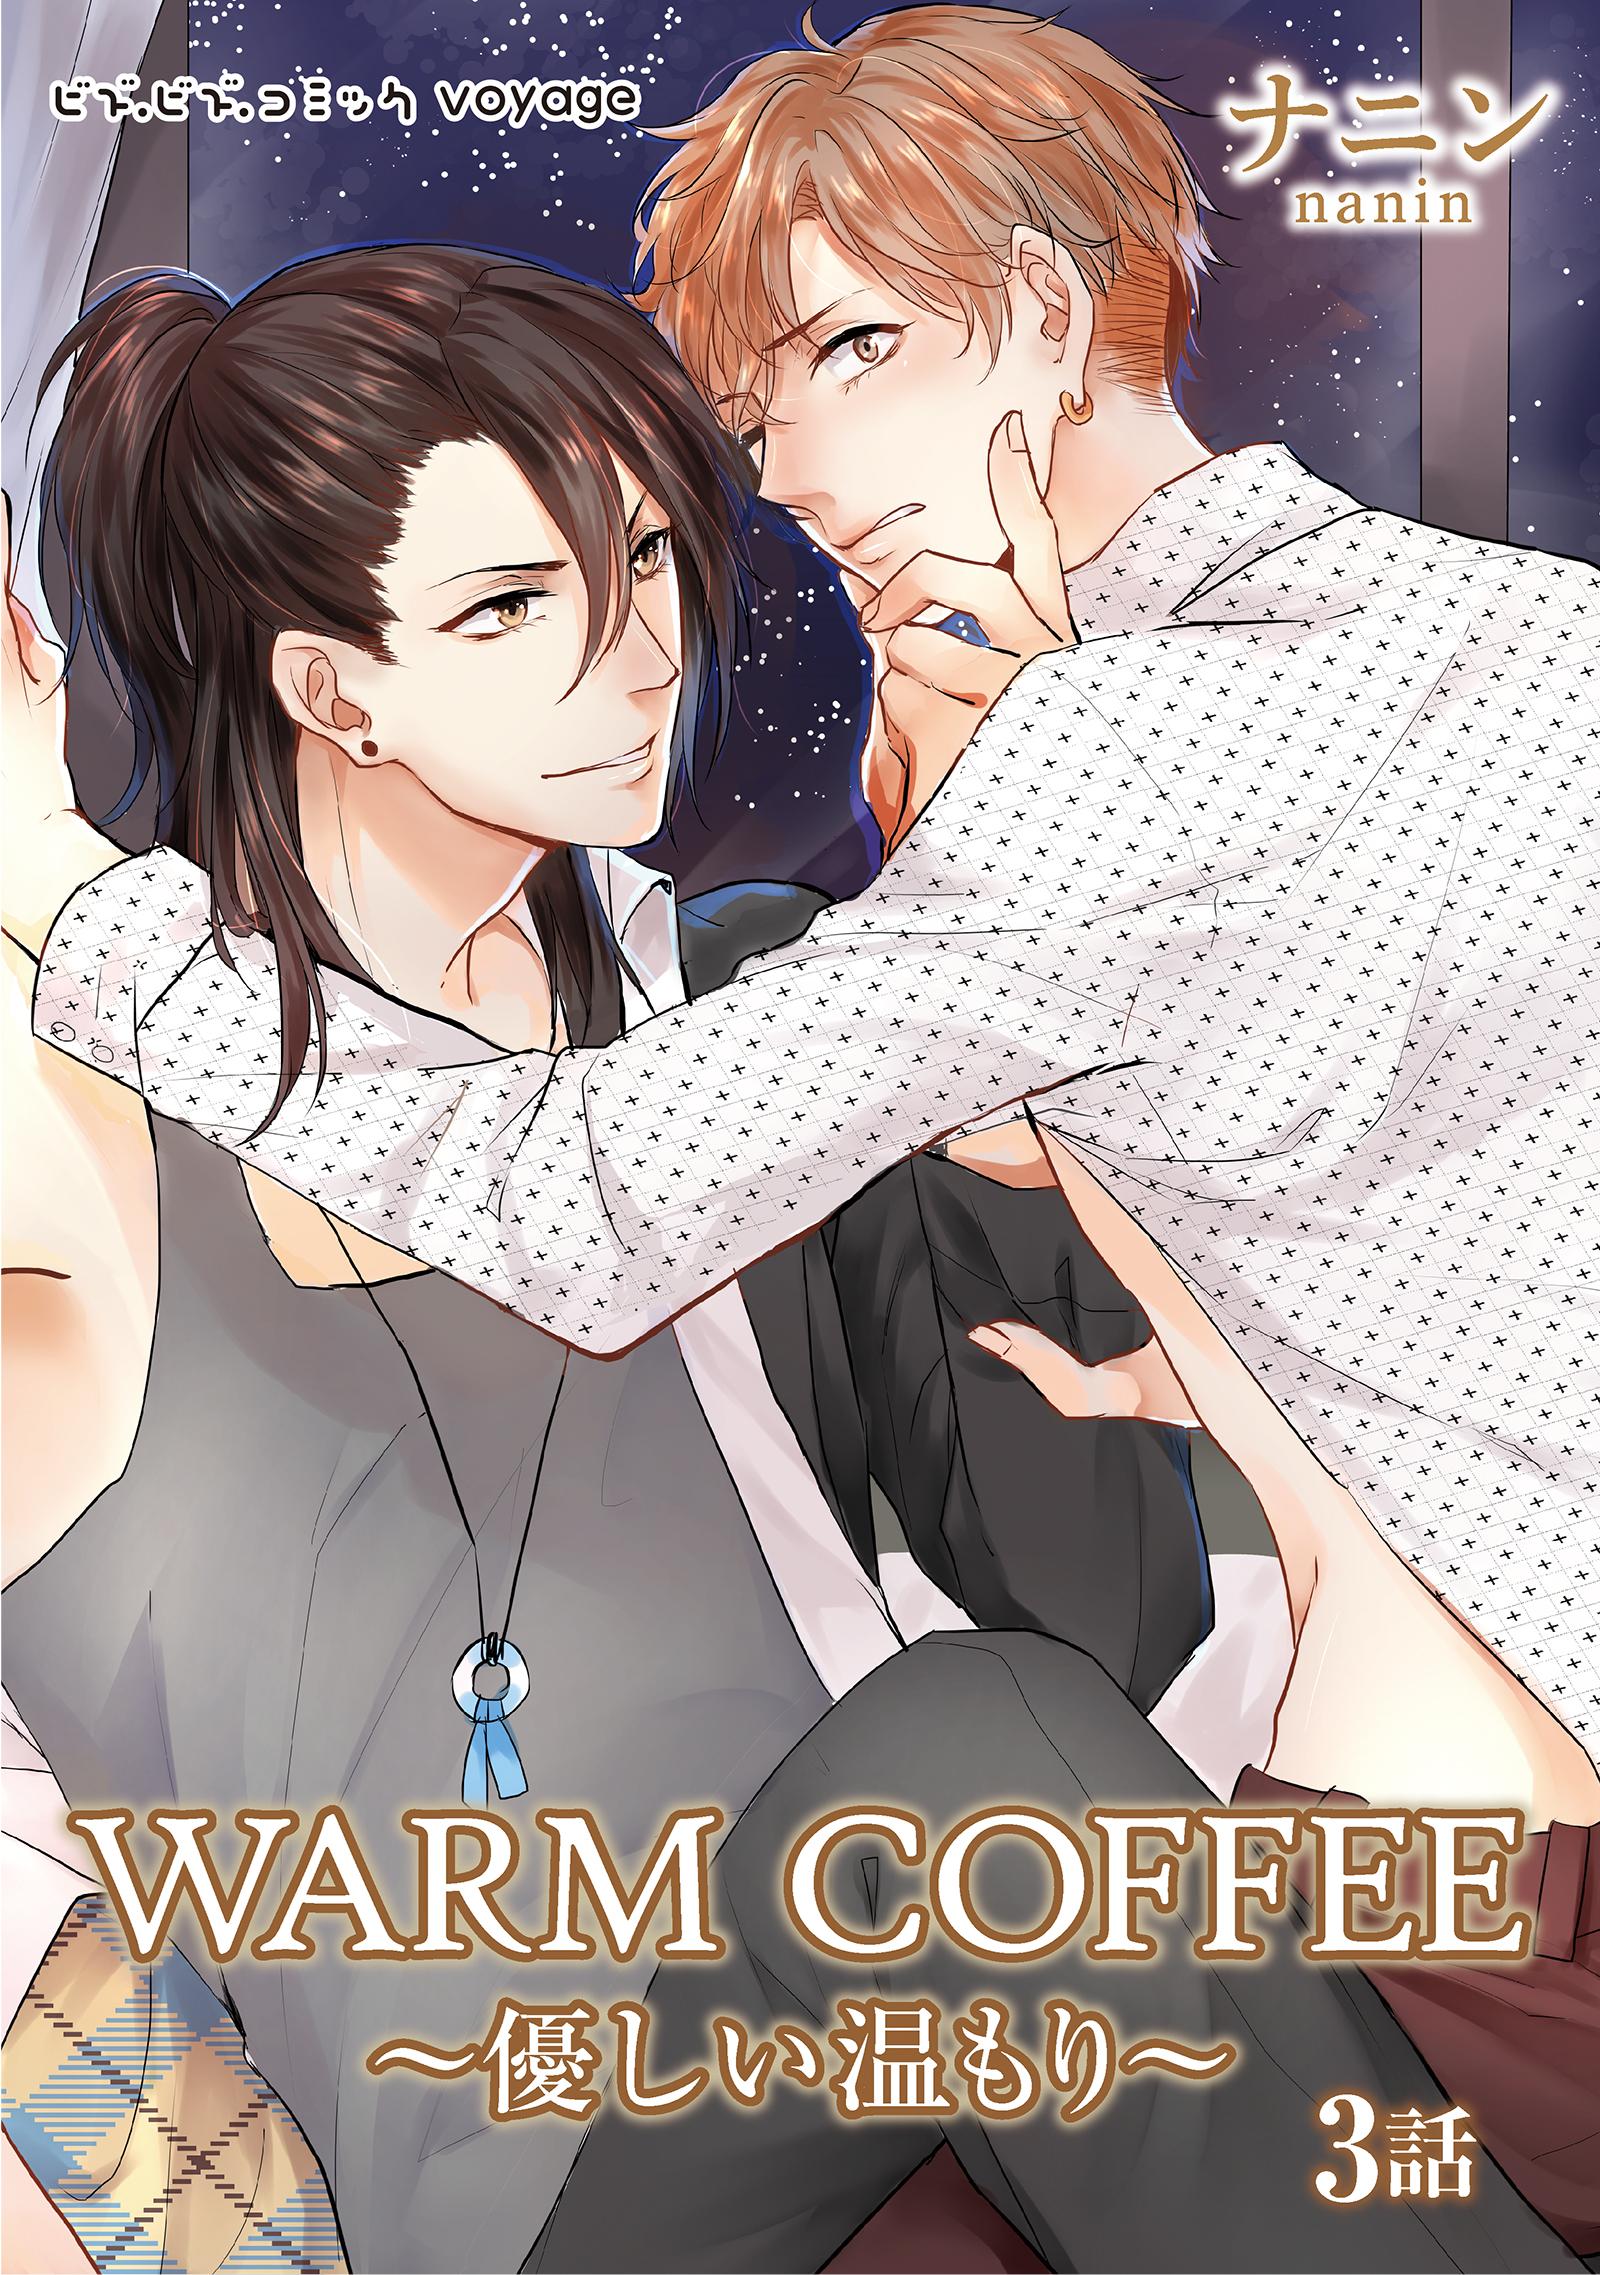 WARM COFFEE~優しい温もり~ 3